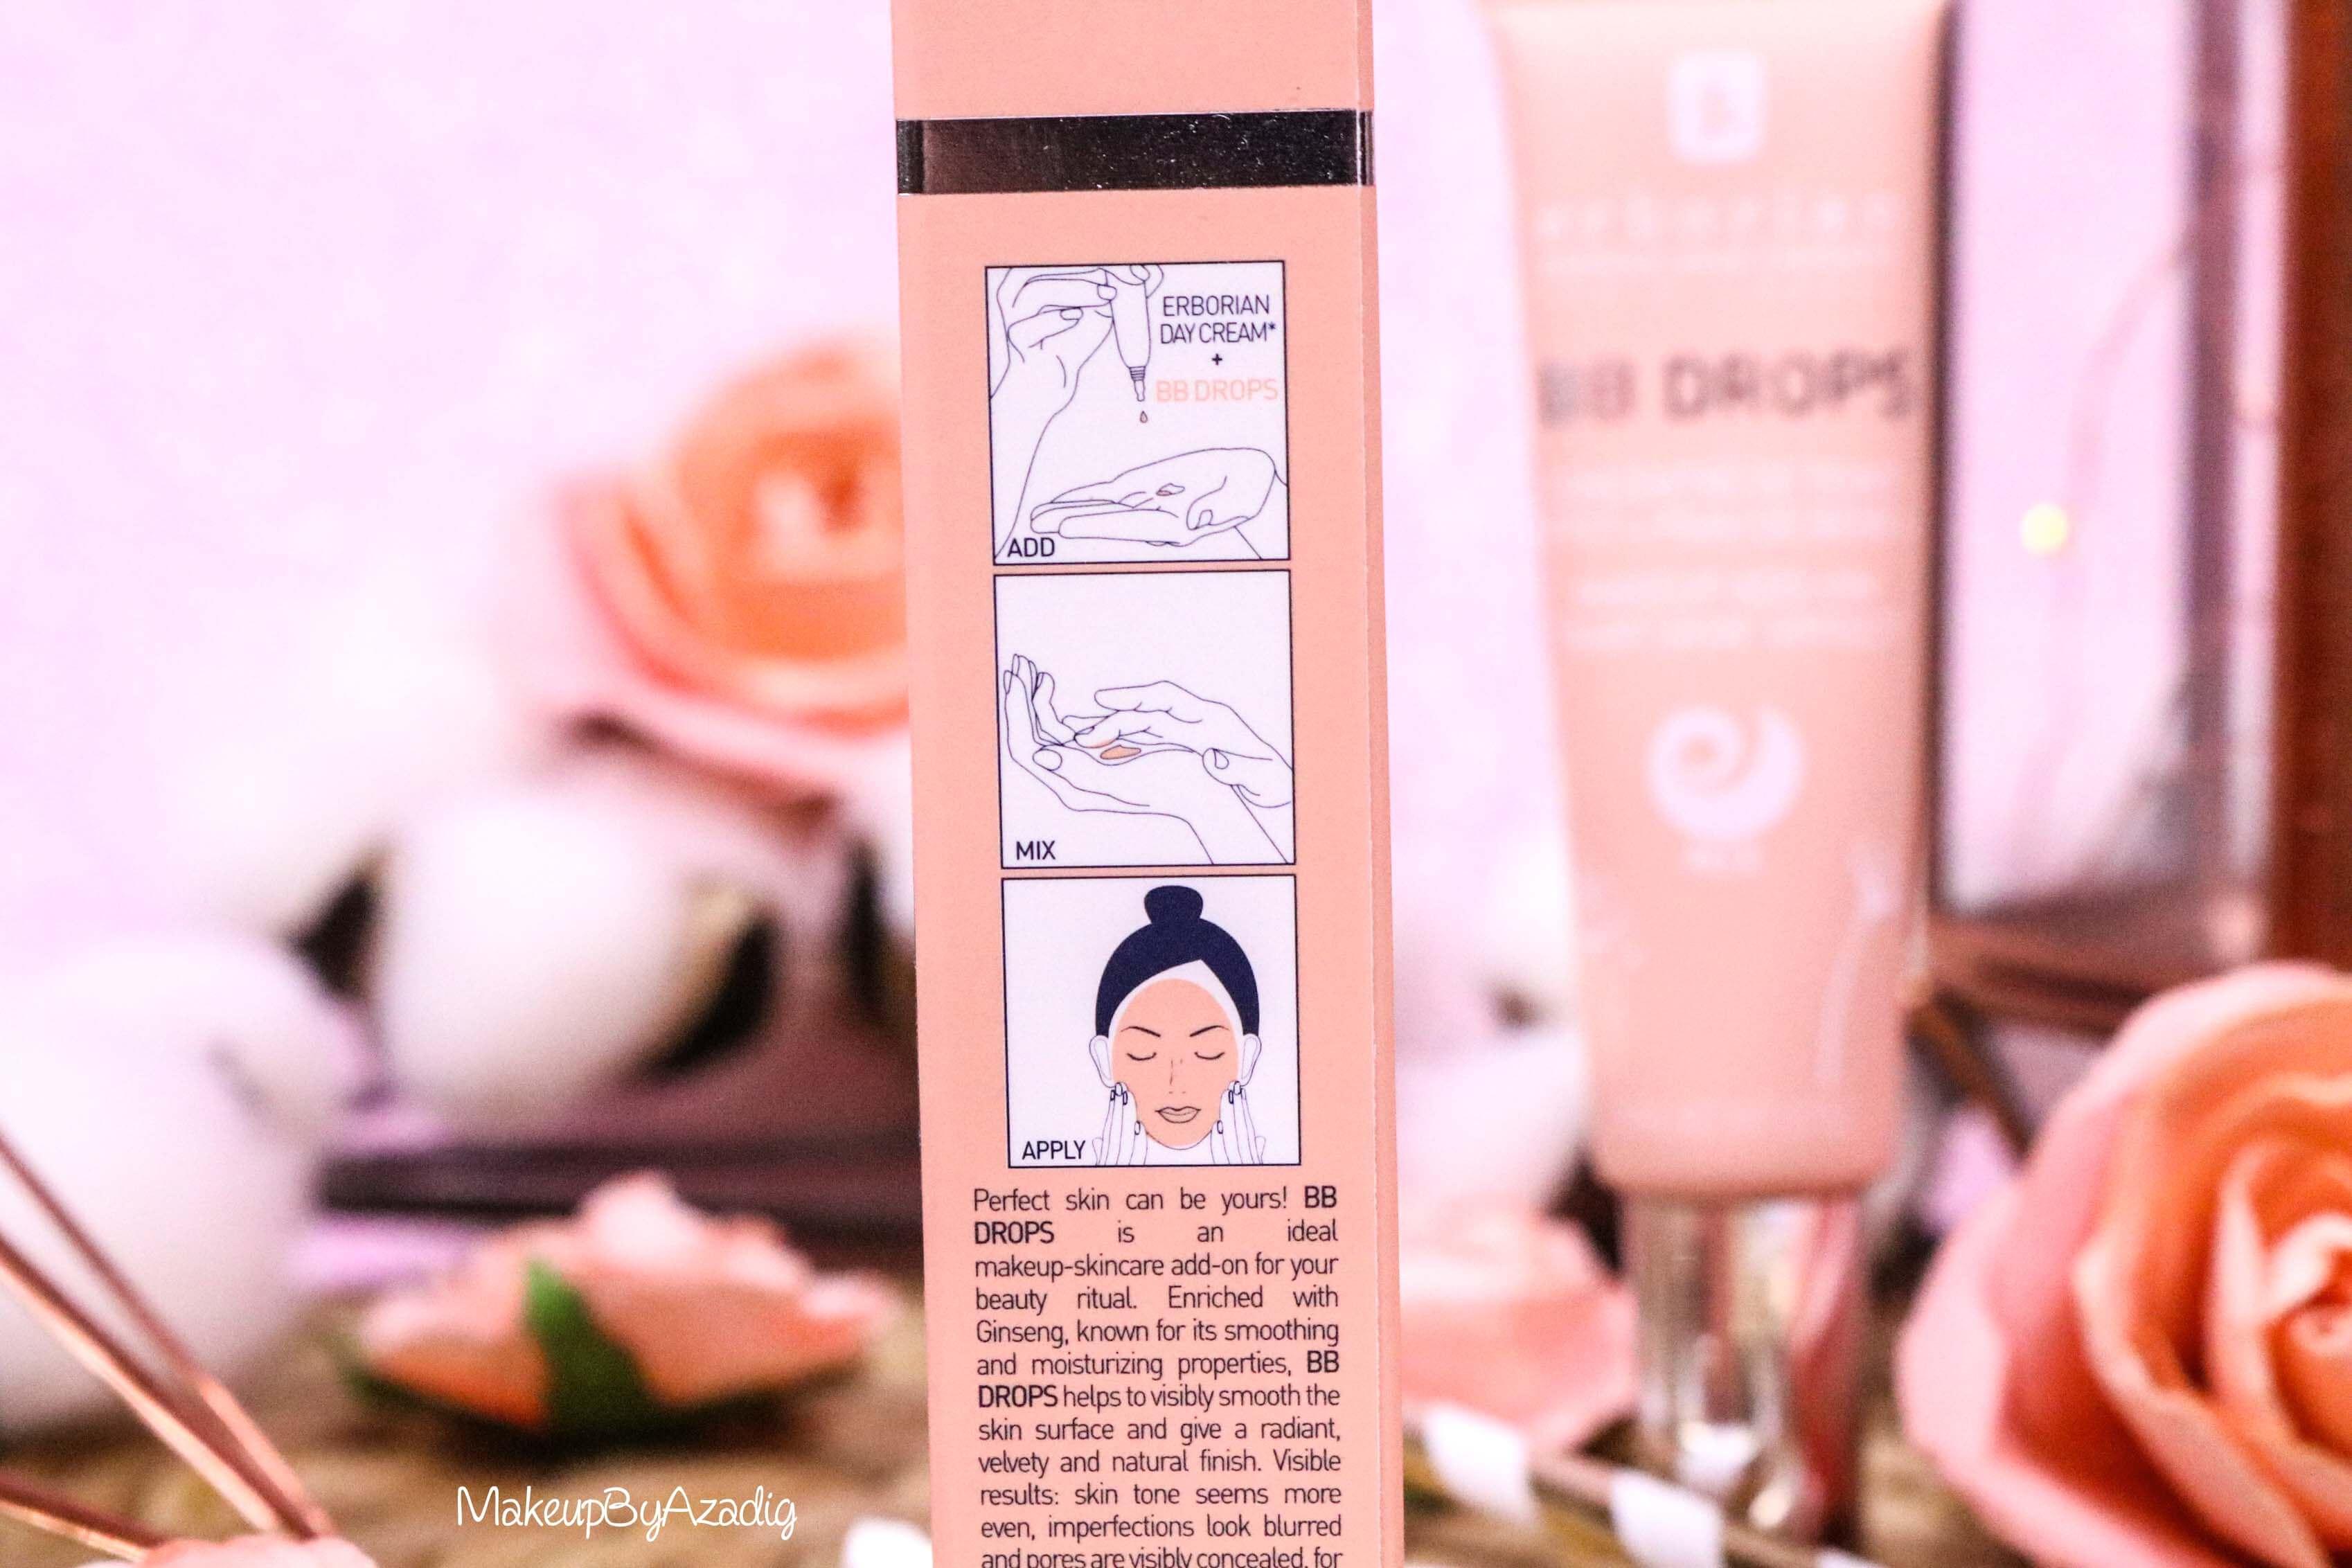 revue-bb-drops-mask-erborian-sephora-teint-parfait-de-bebe-avis-prix-swatch-makeupbyazadig-nouveaute-application